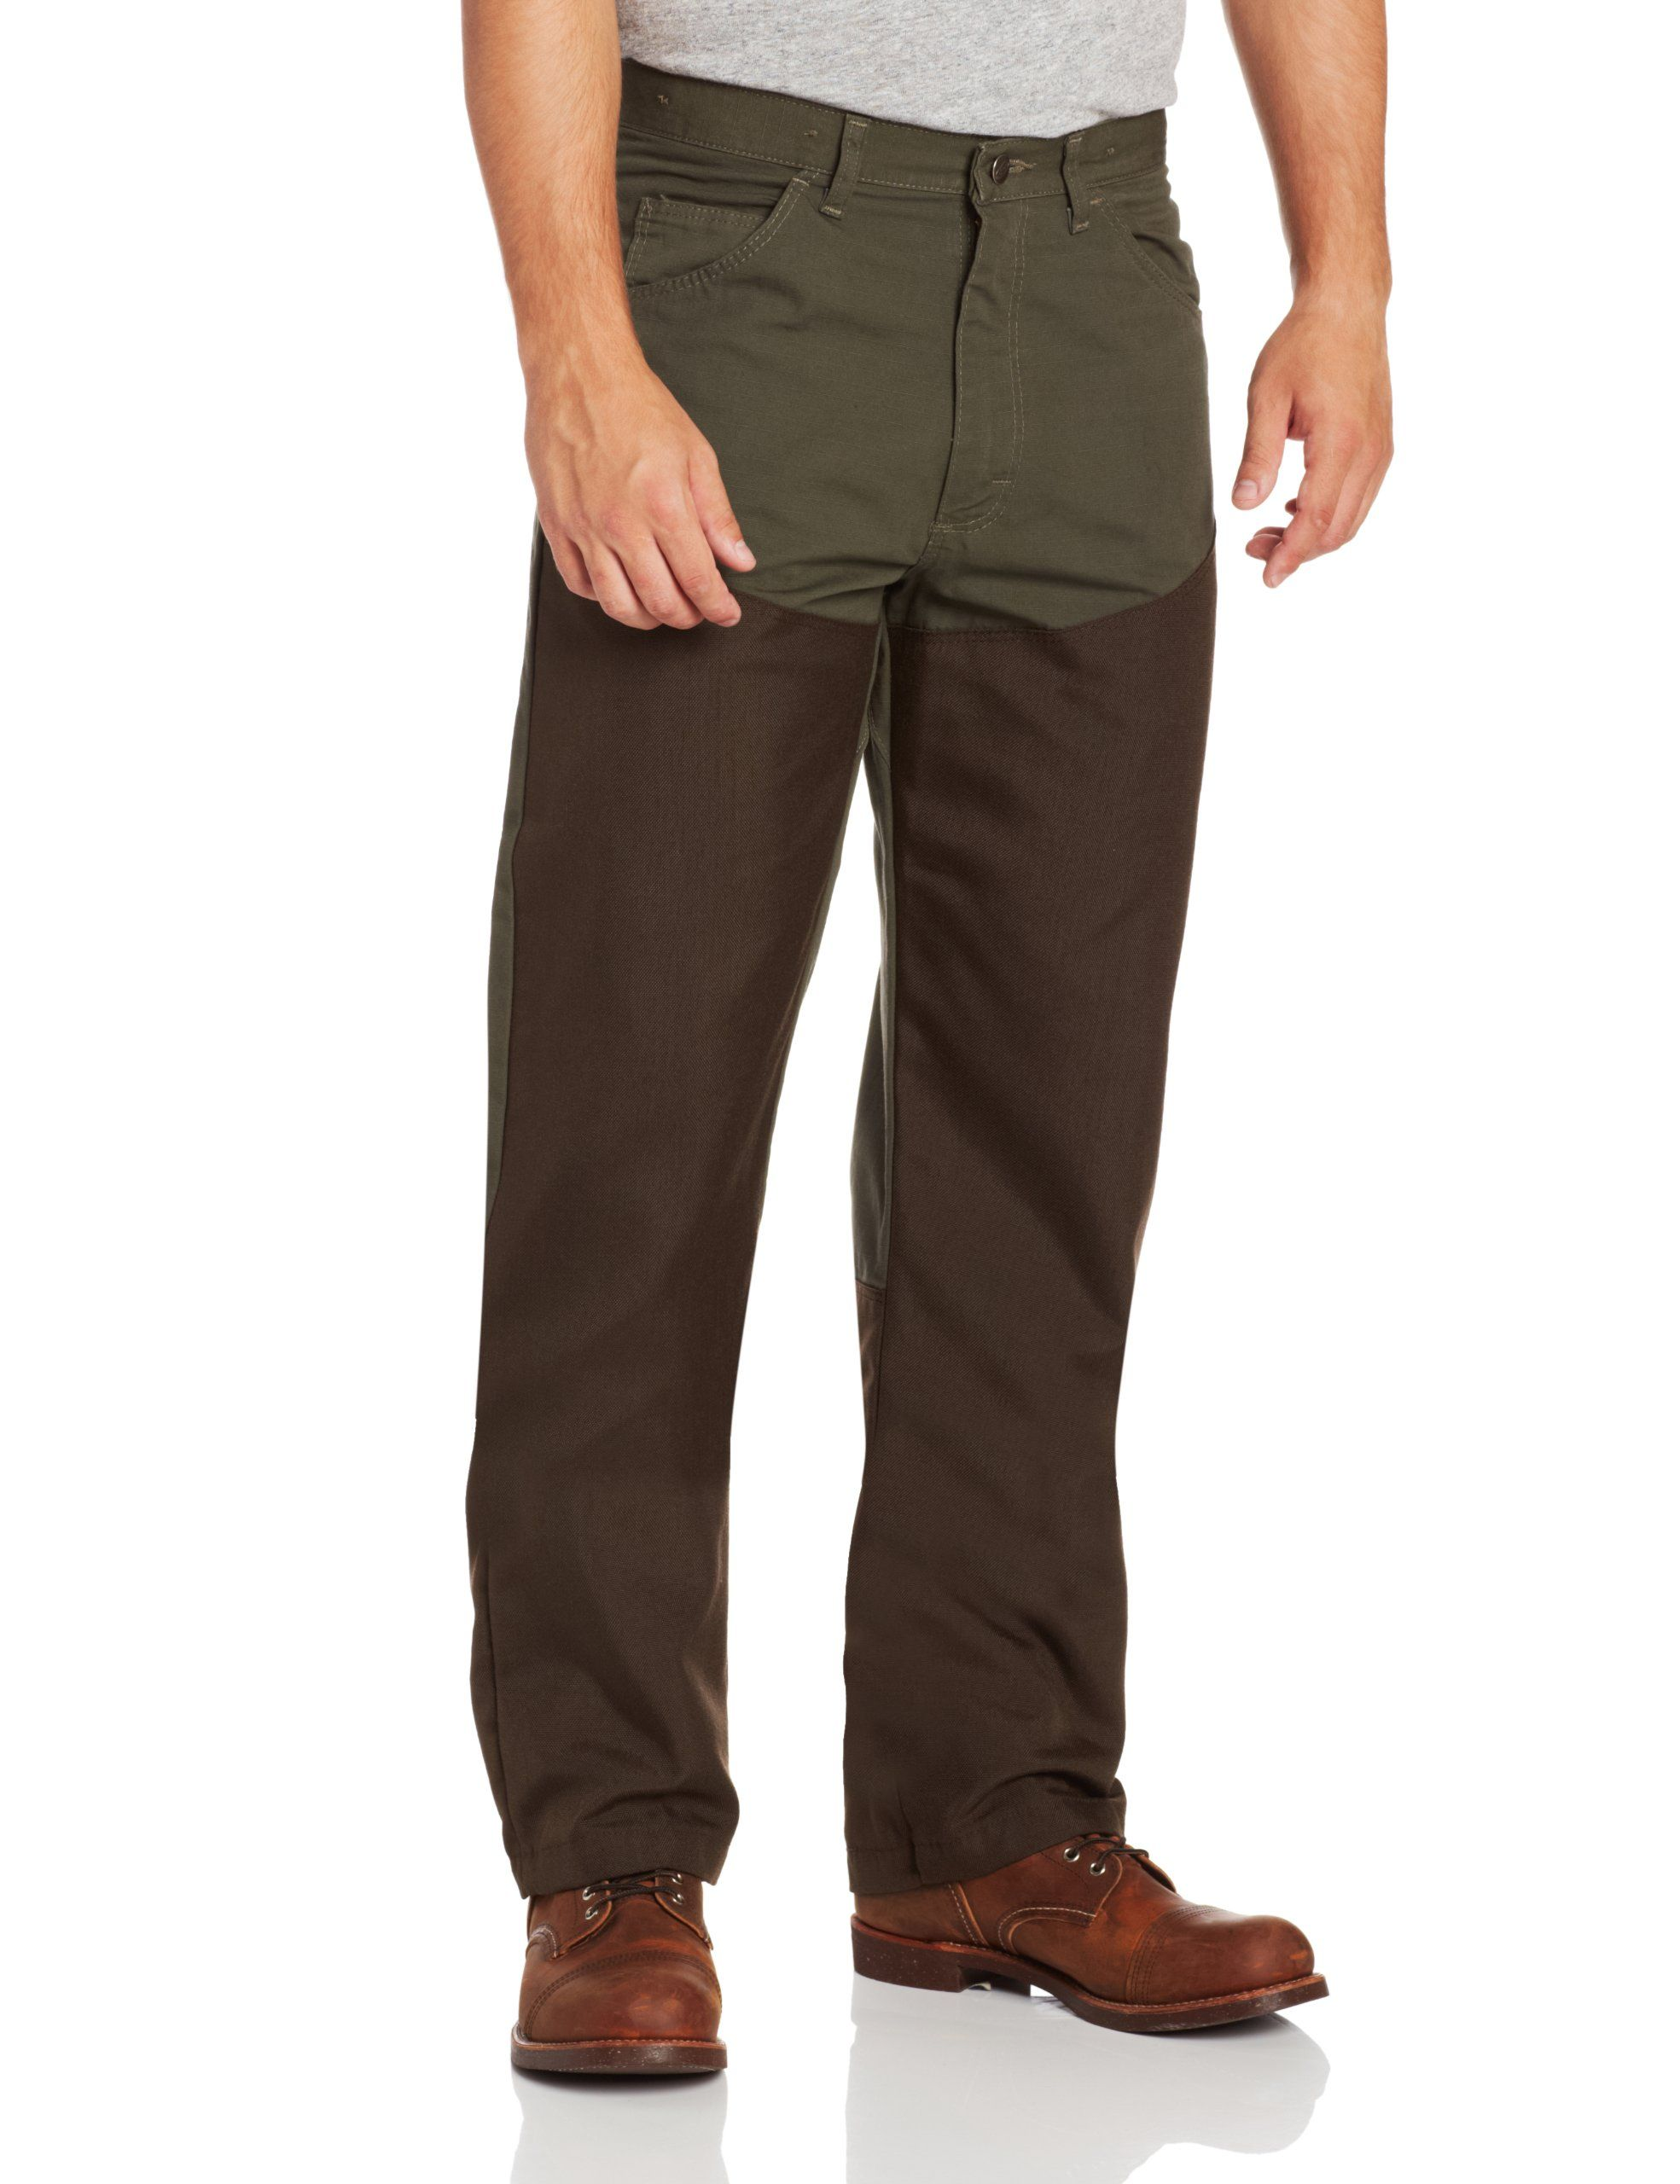 67b503cd93415 Amazon- Wrangler Men's ProGear Upland Jean at Amazon Men's Clothing store:  Briar Pants